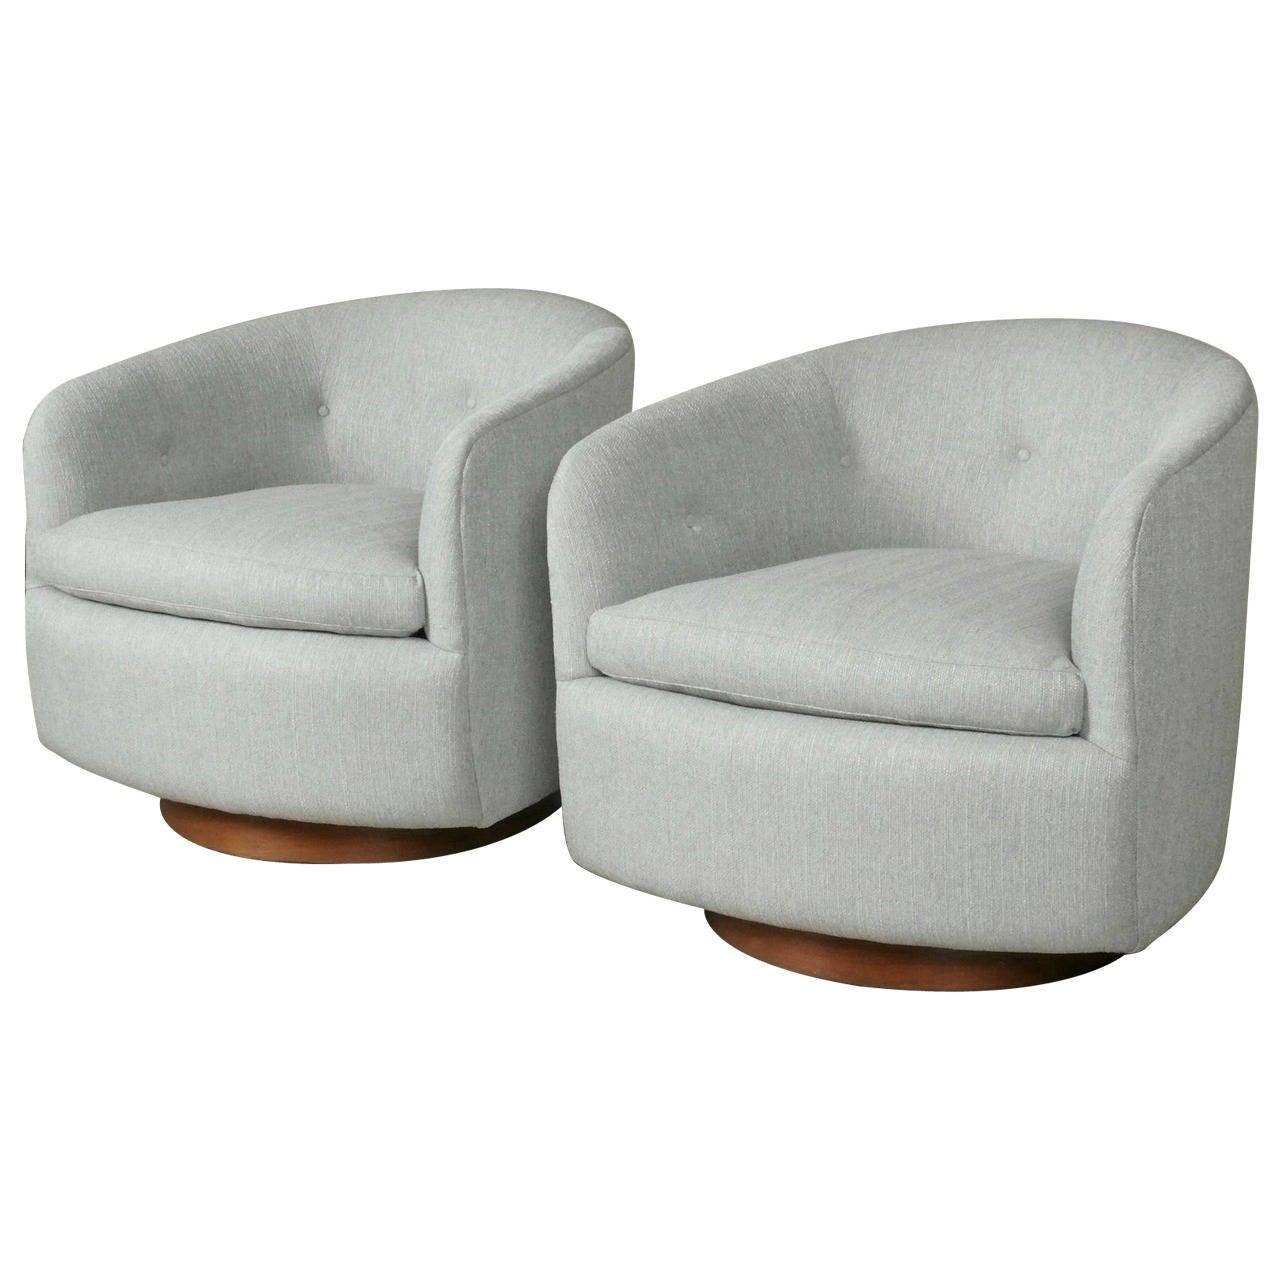 Pair of Swivel Rocking Tub Chairs by Milo Baughman circa